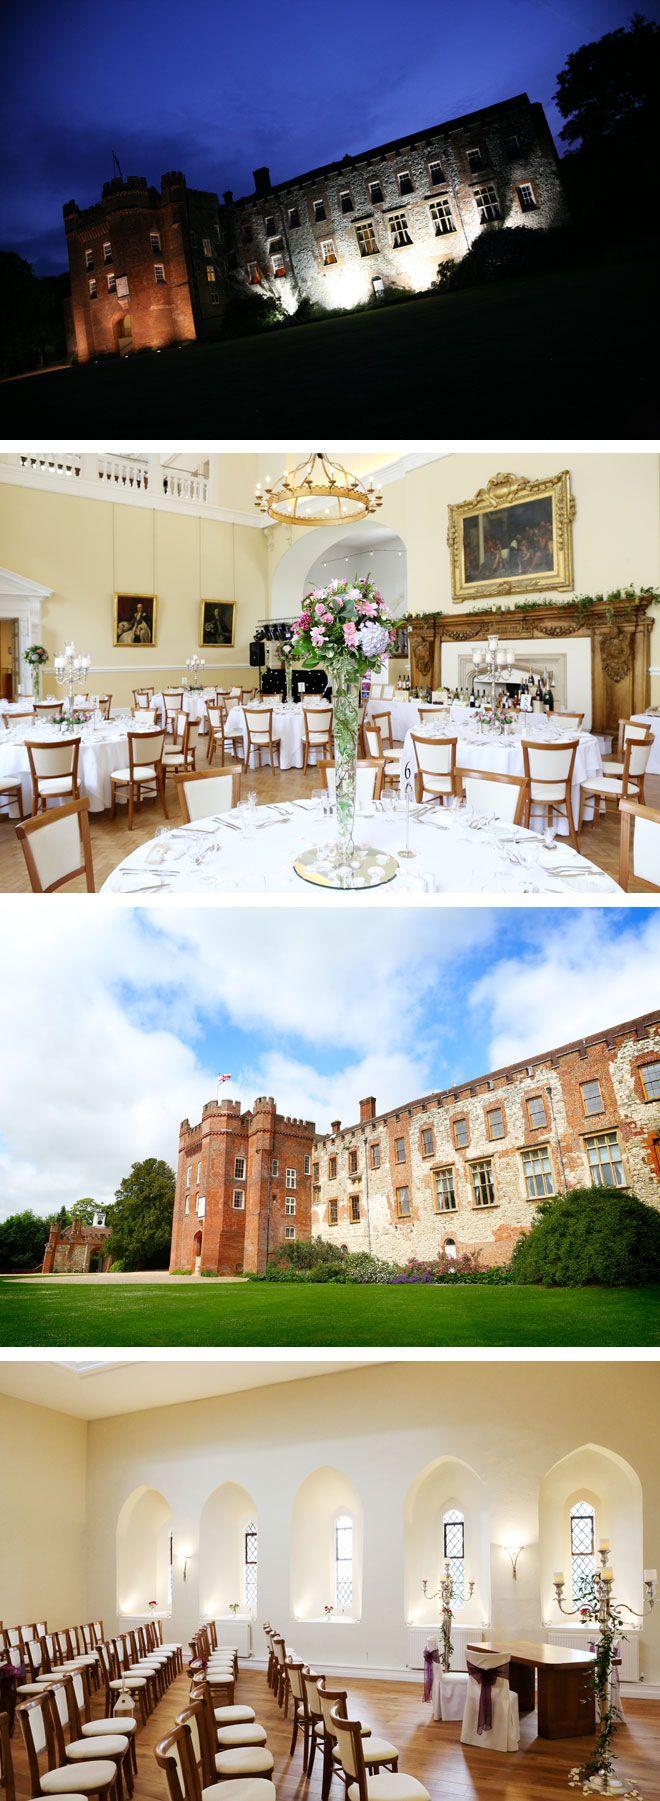 Farnham Castle halloween wedding venue in Surrey | Visit: www.wedding-venues.co.uk